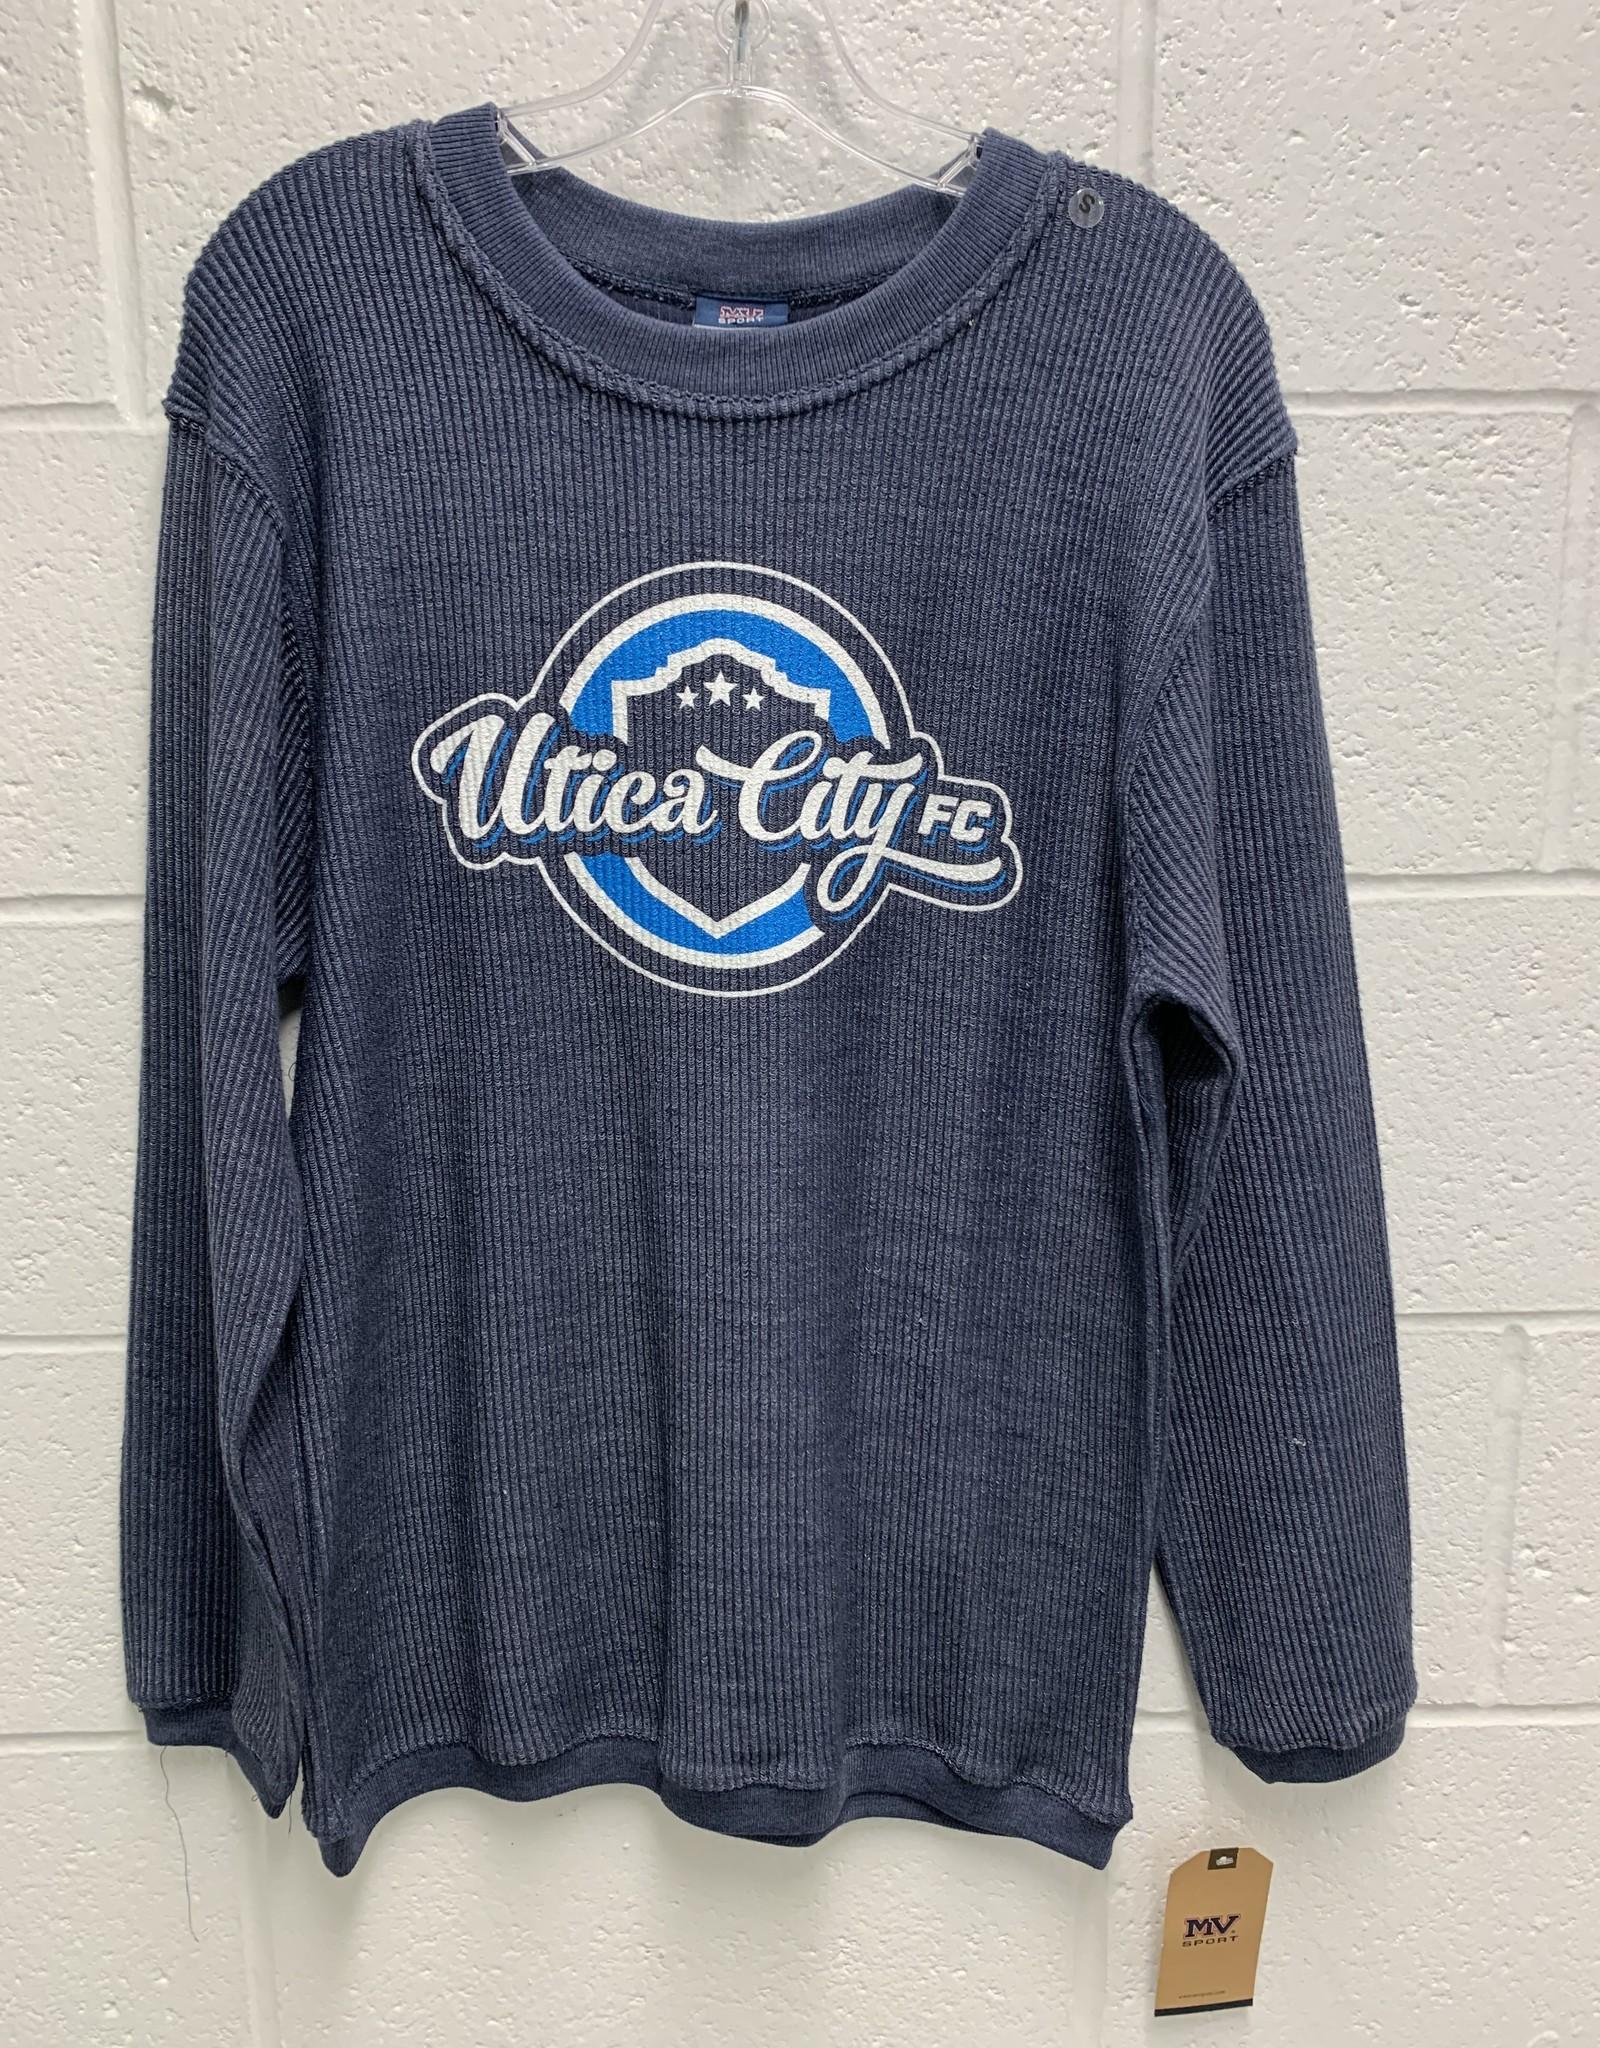 MV Sport Blue Corduroy Crew Neck Sweatshirt w/ Retro UCFC Logo